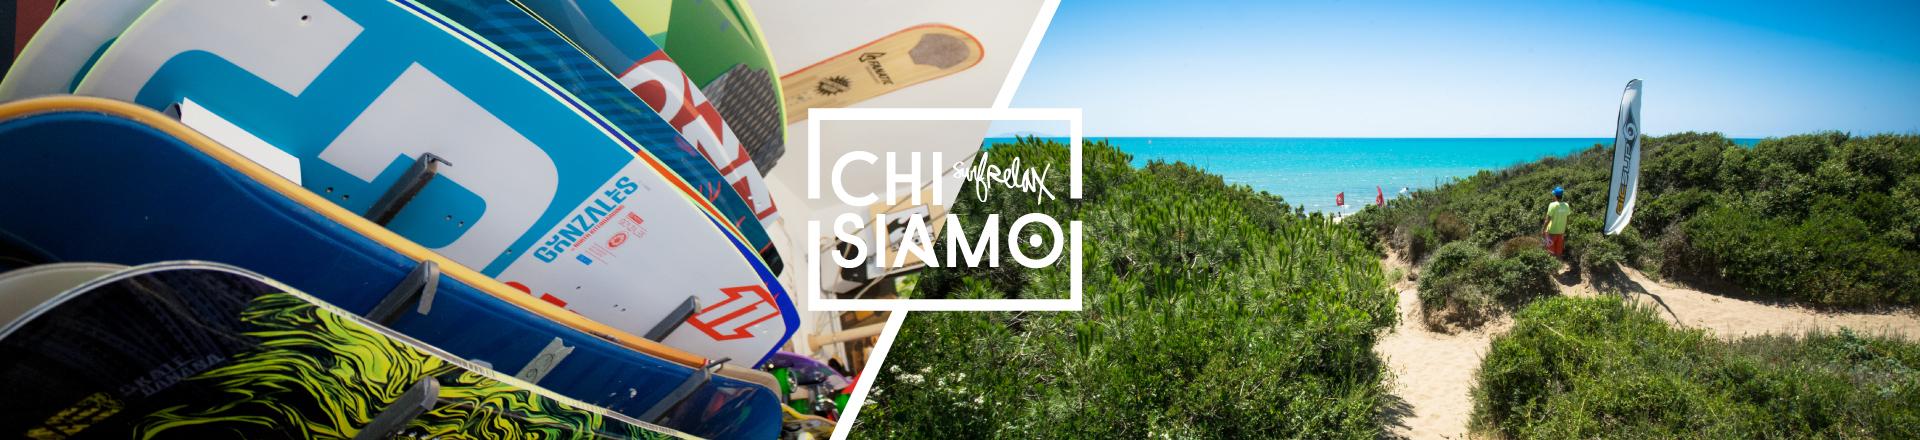 slideshow_chisiamo